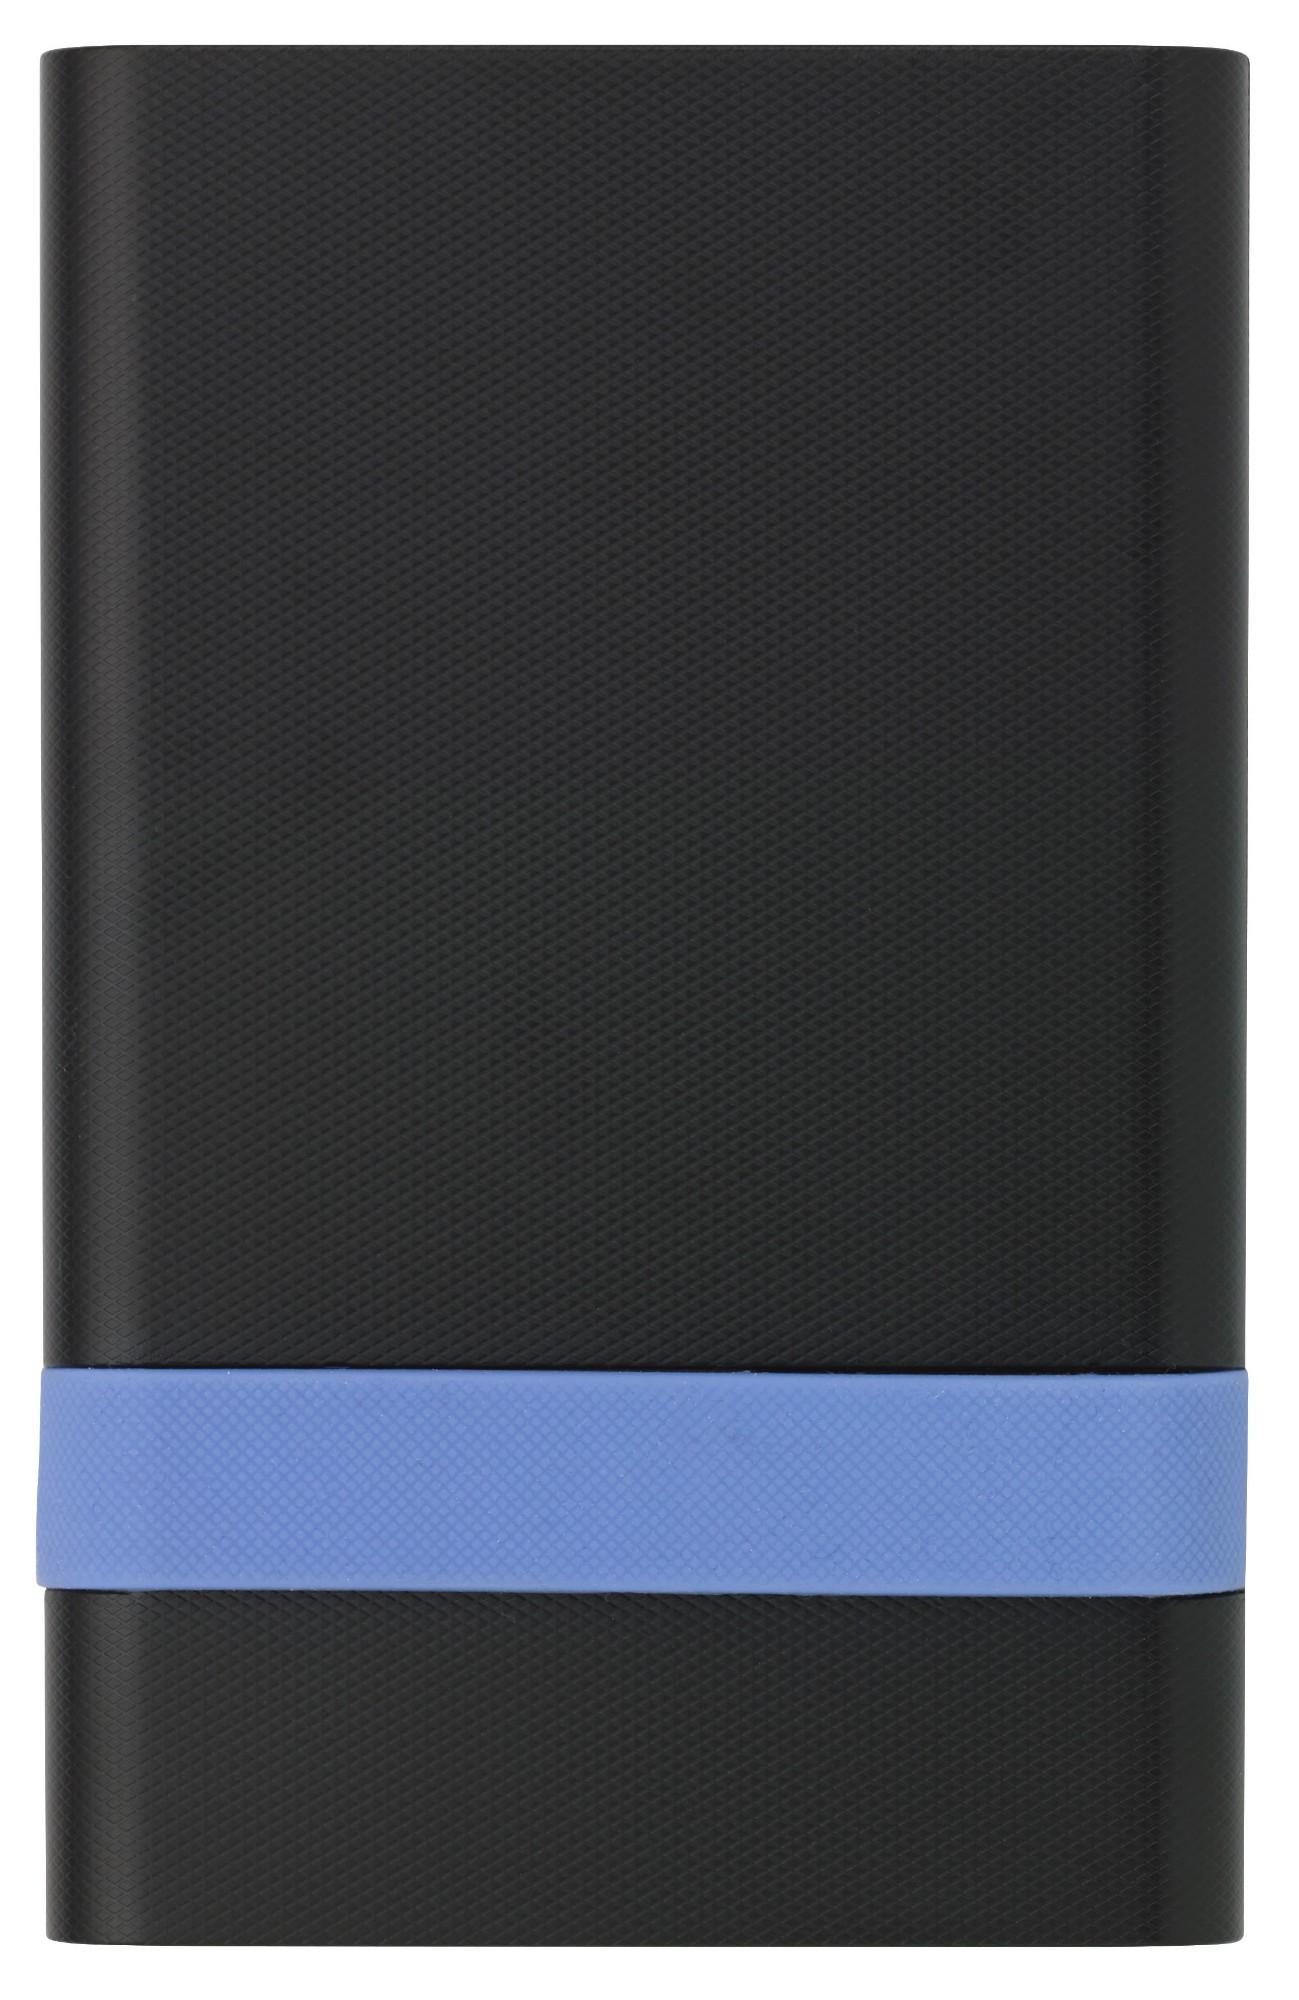 "Verbatim Store'N'Go Enclosure Kit HDD/SSD enclosure Black, Blue 2.5"""